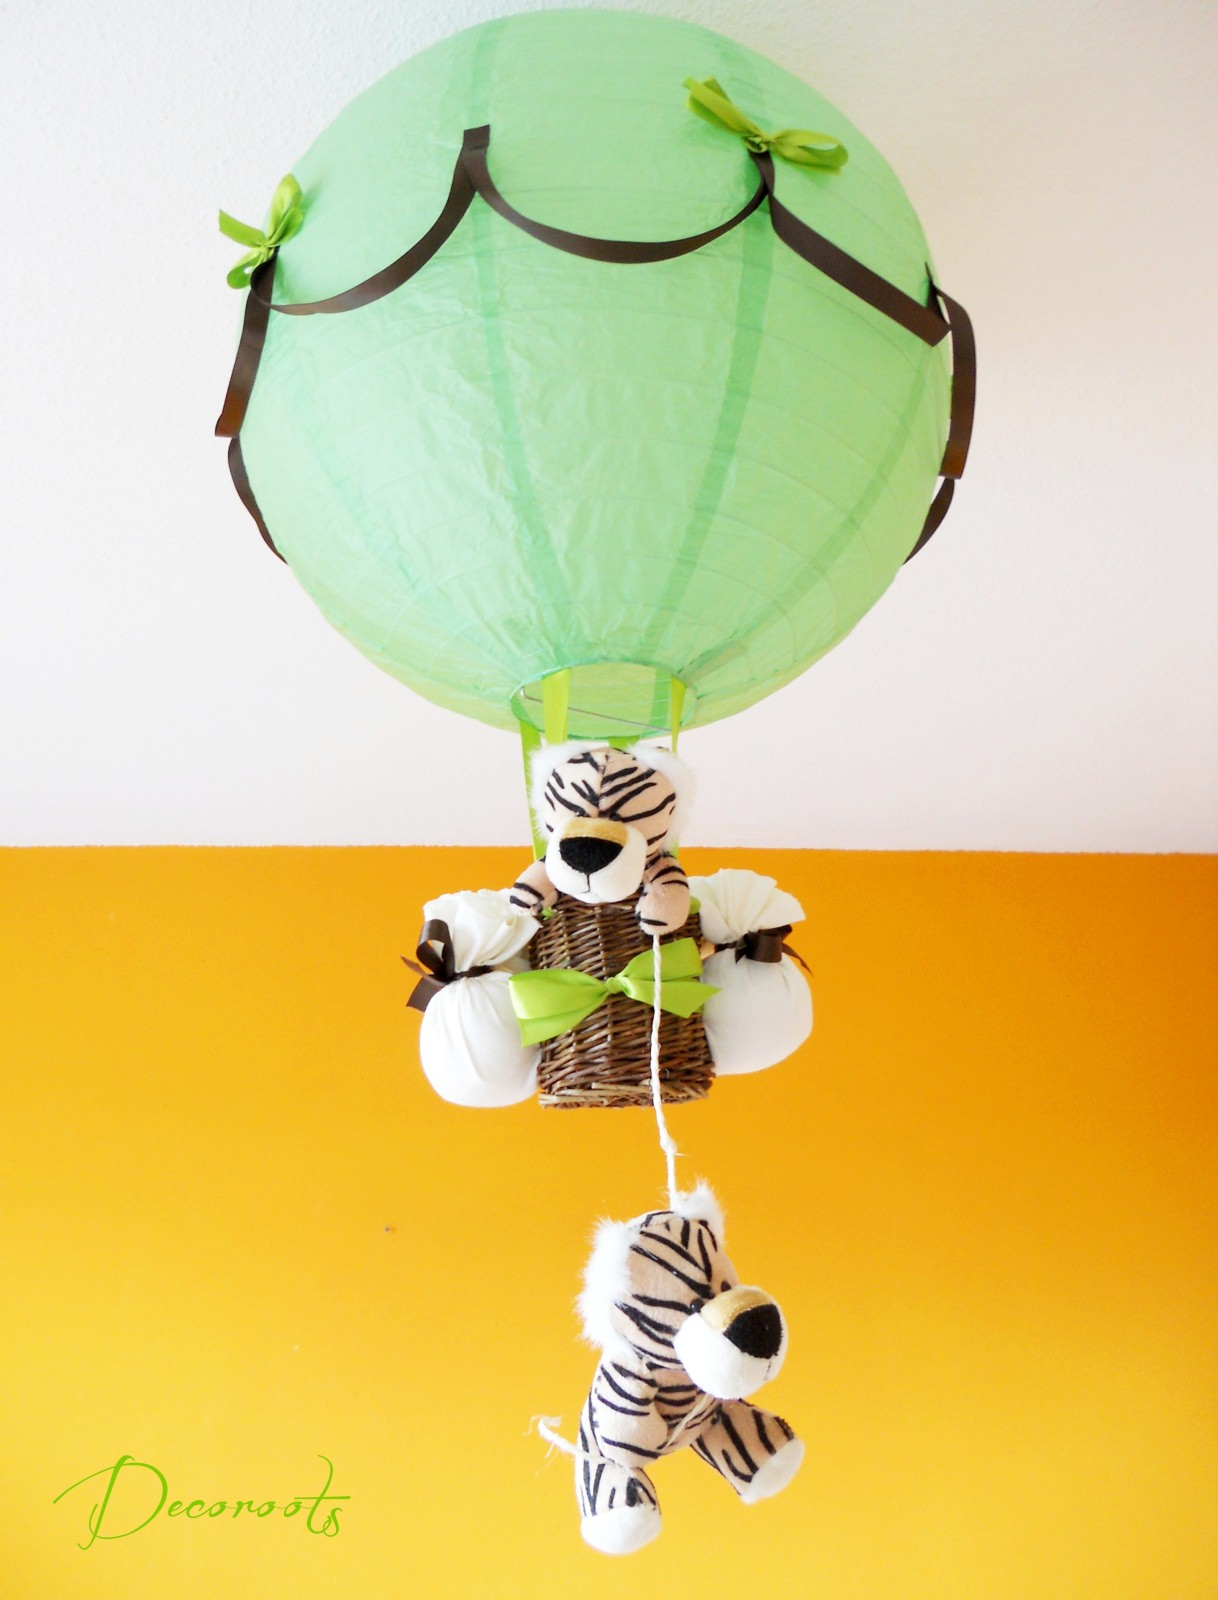 Stunning chambre marron chocolat et vert anis images design trends 2017 - Chambre vert anis et marron ...